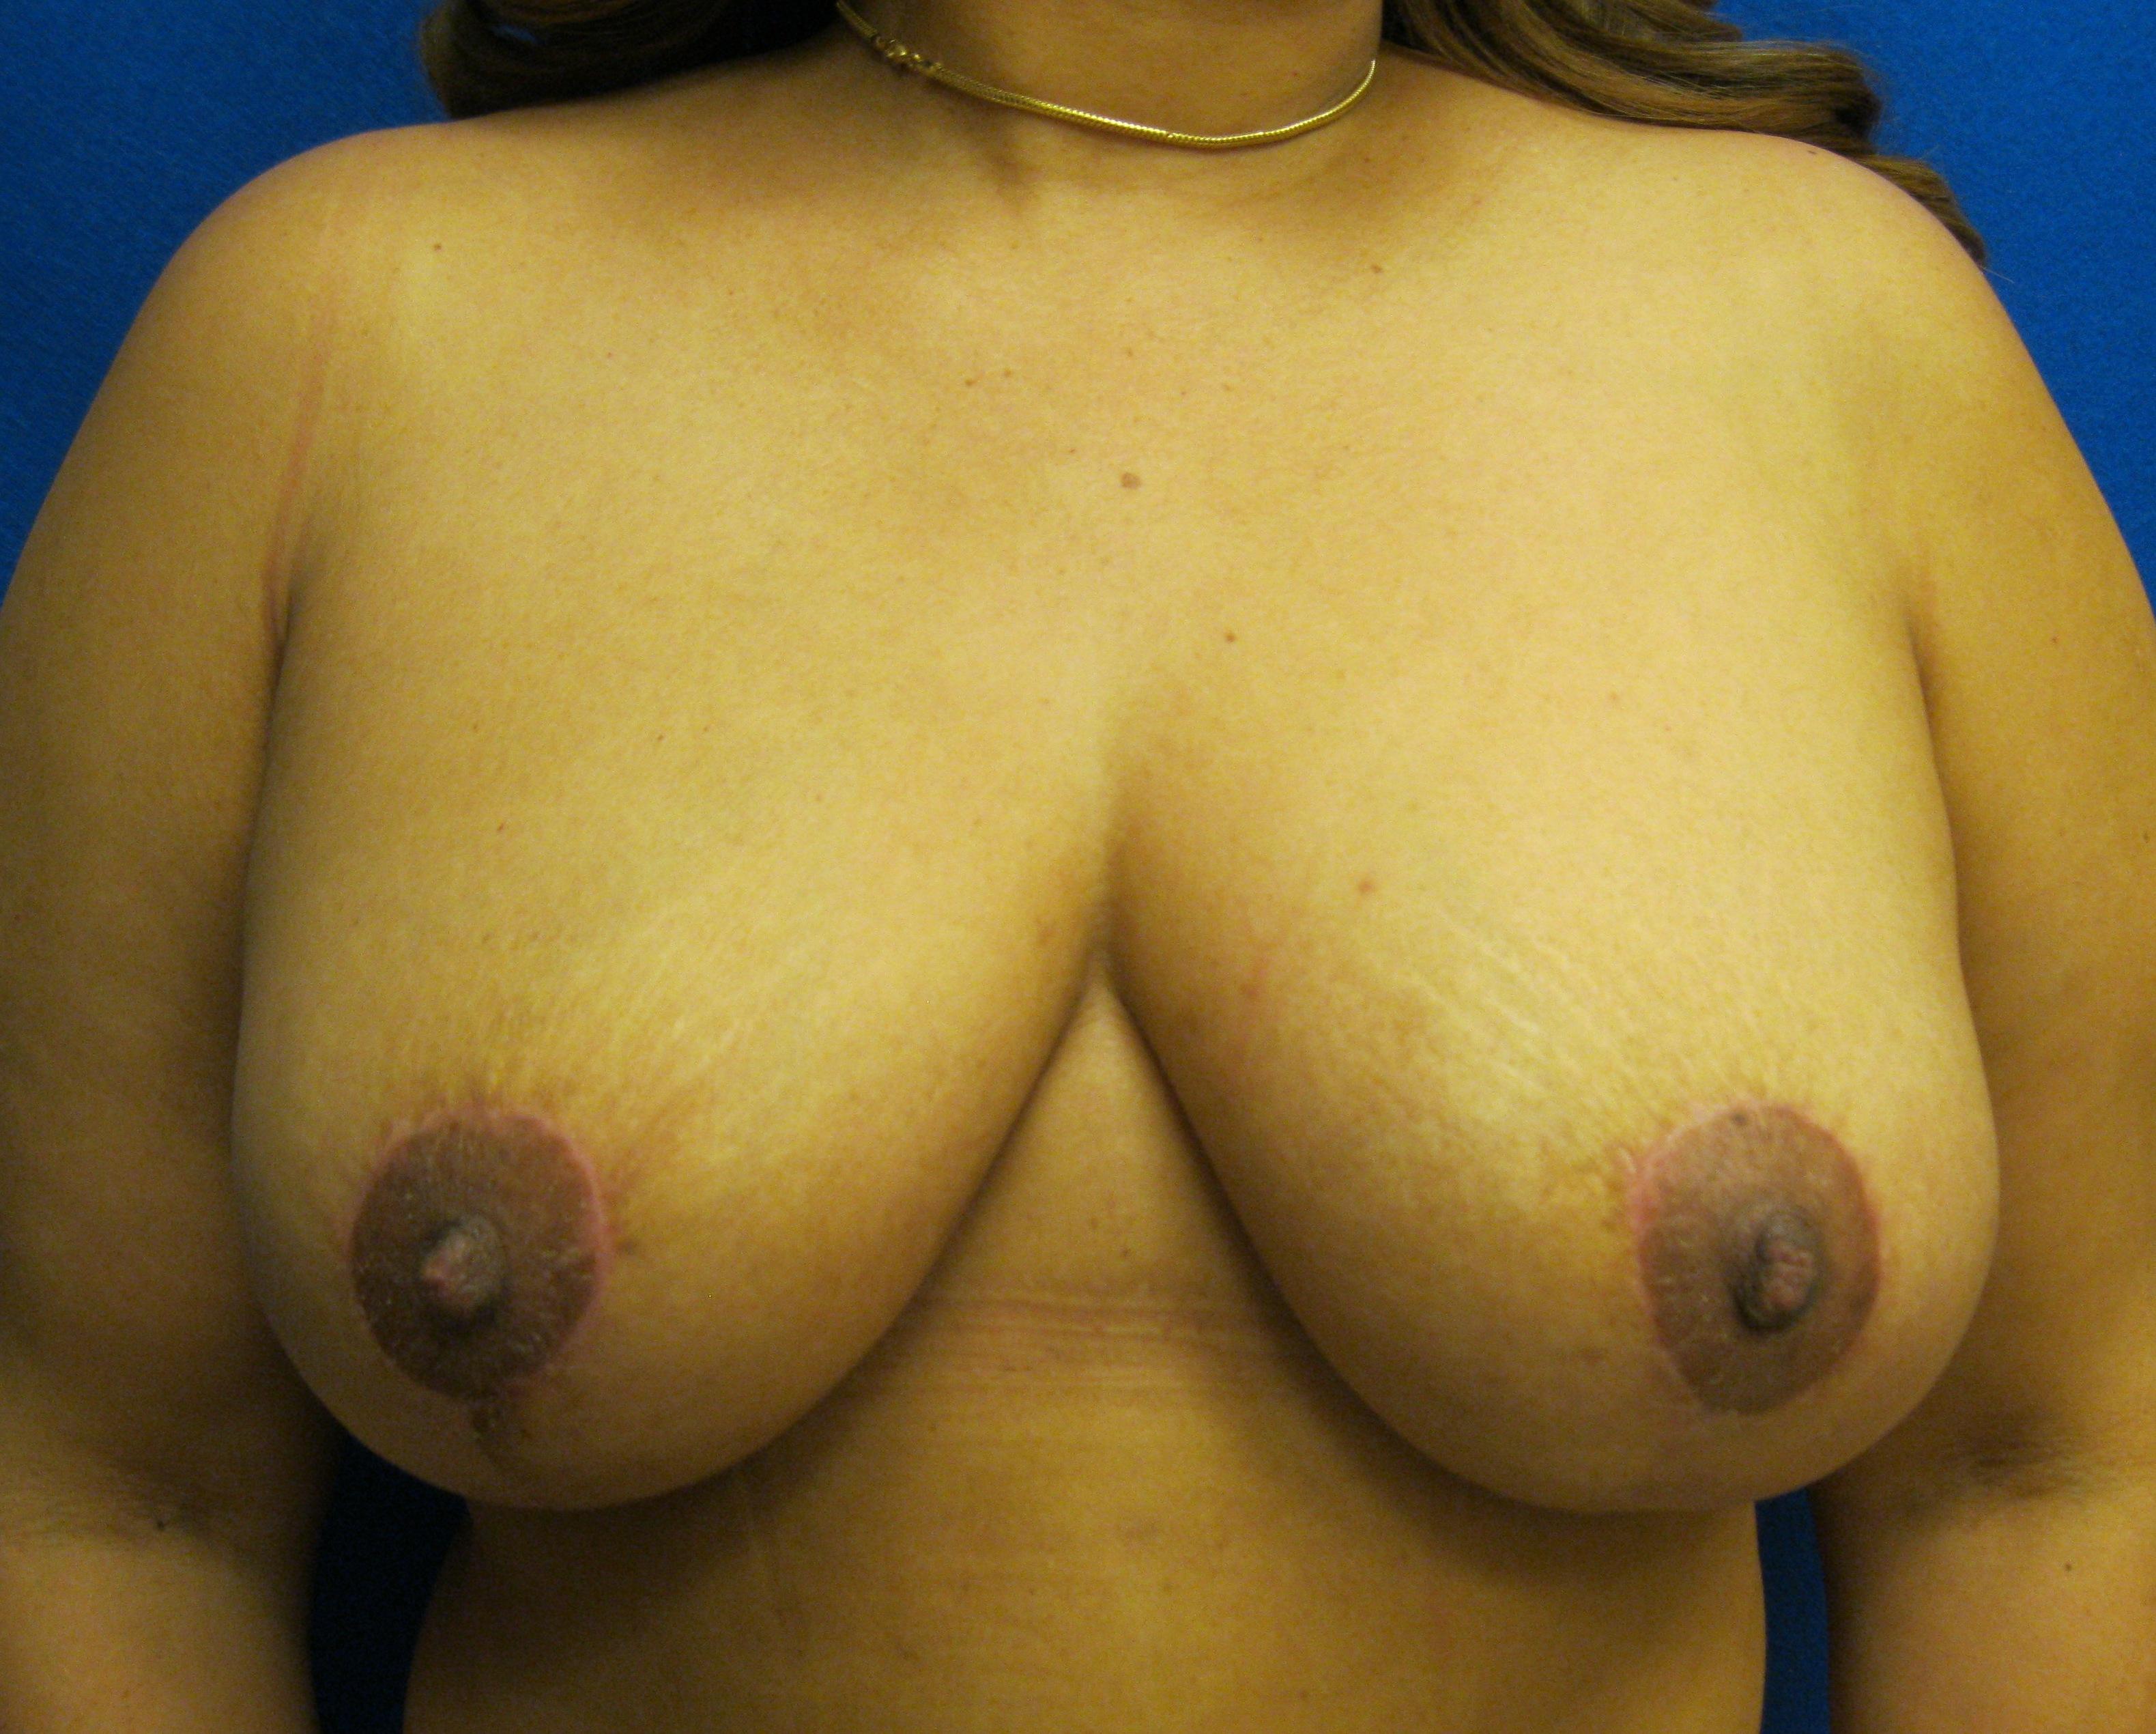 Mommy makeover breast lift photo Fairfield Westport Bridgeport Connecticut Jandali Plastic Surgery